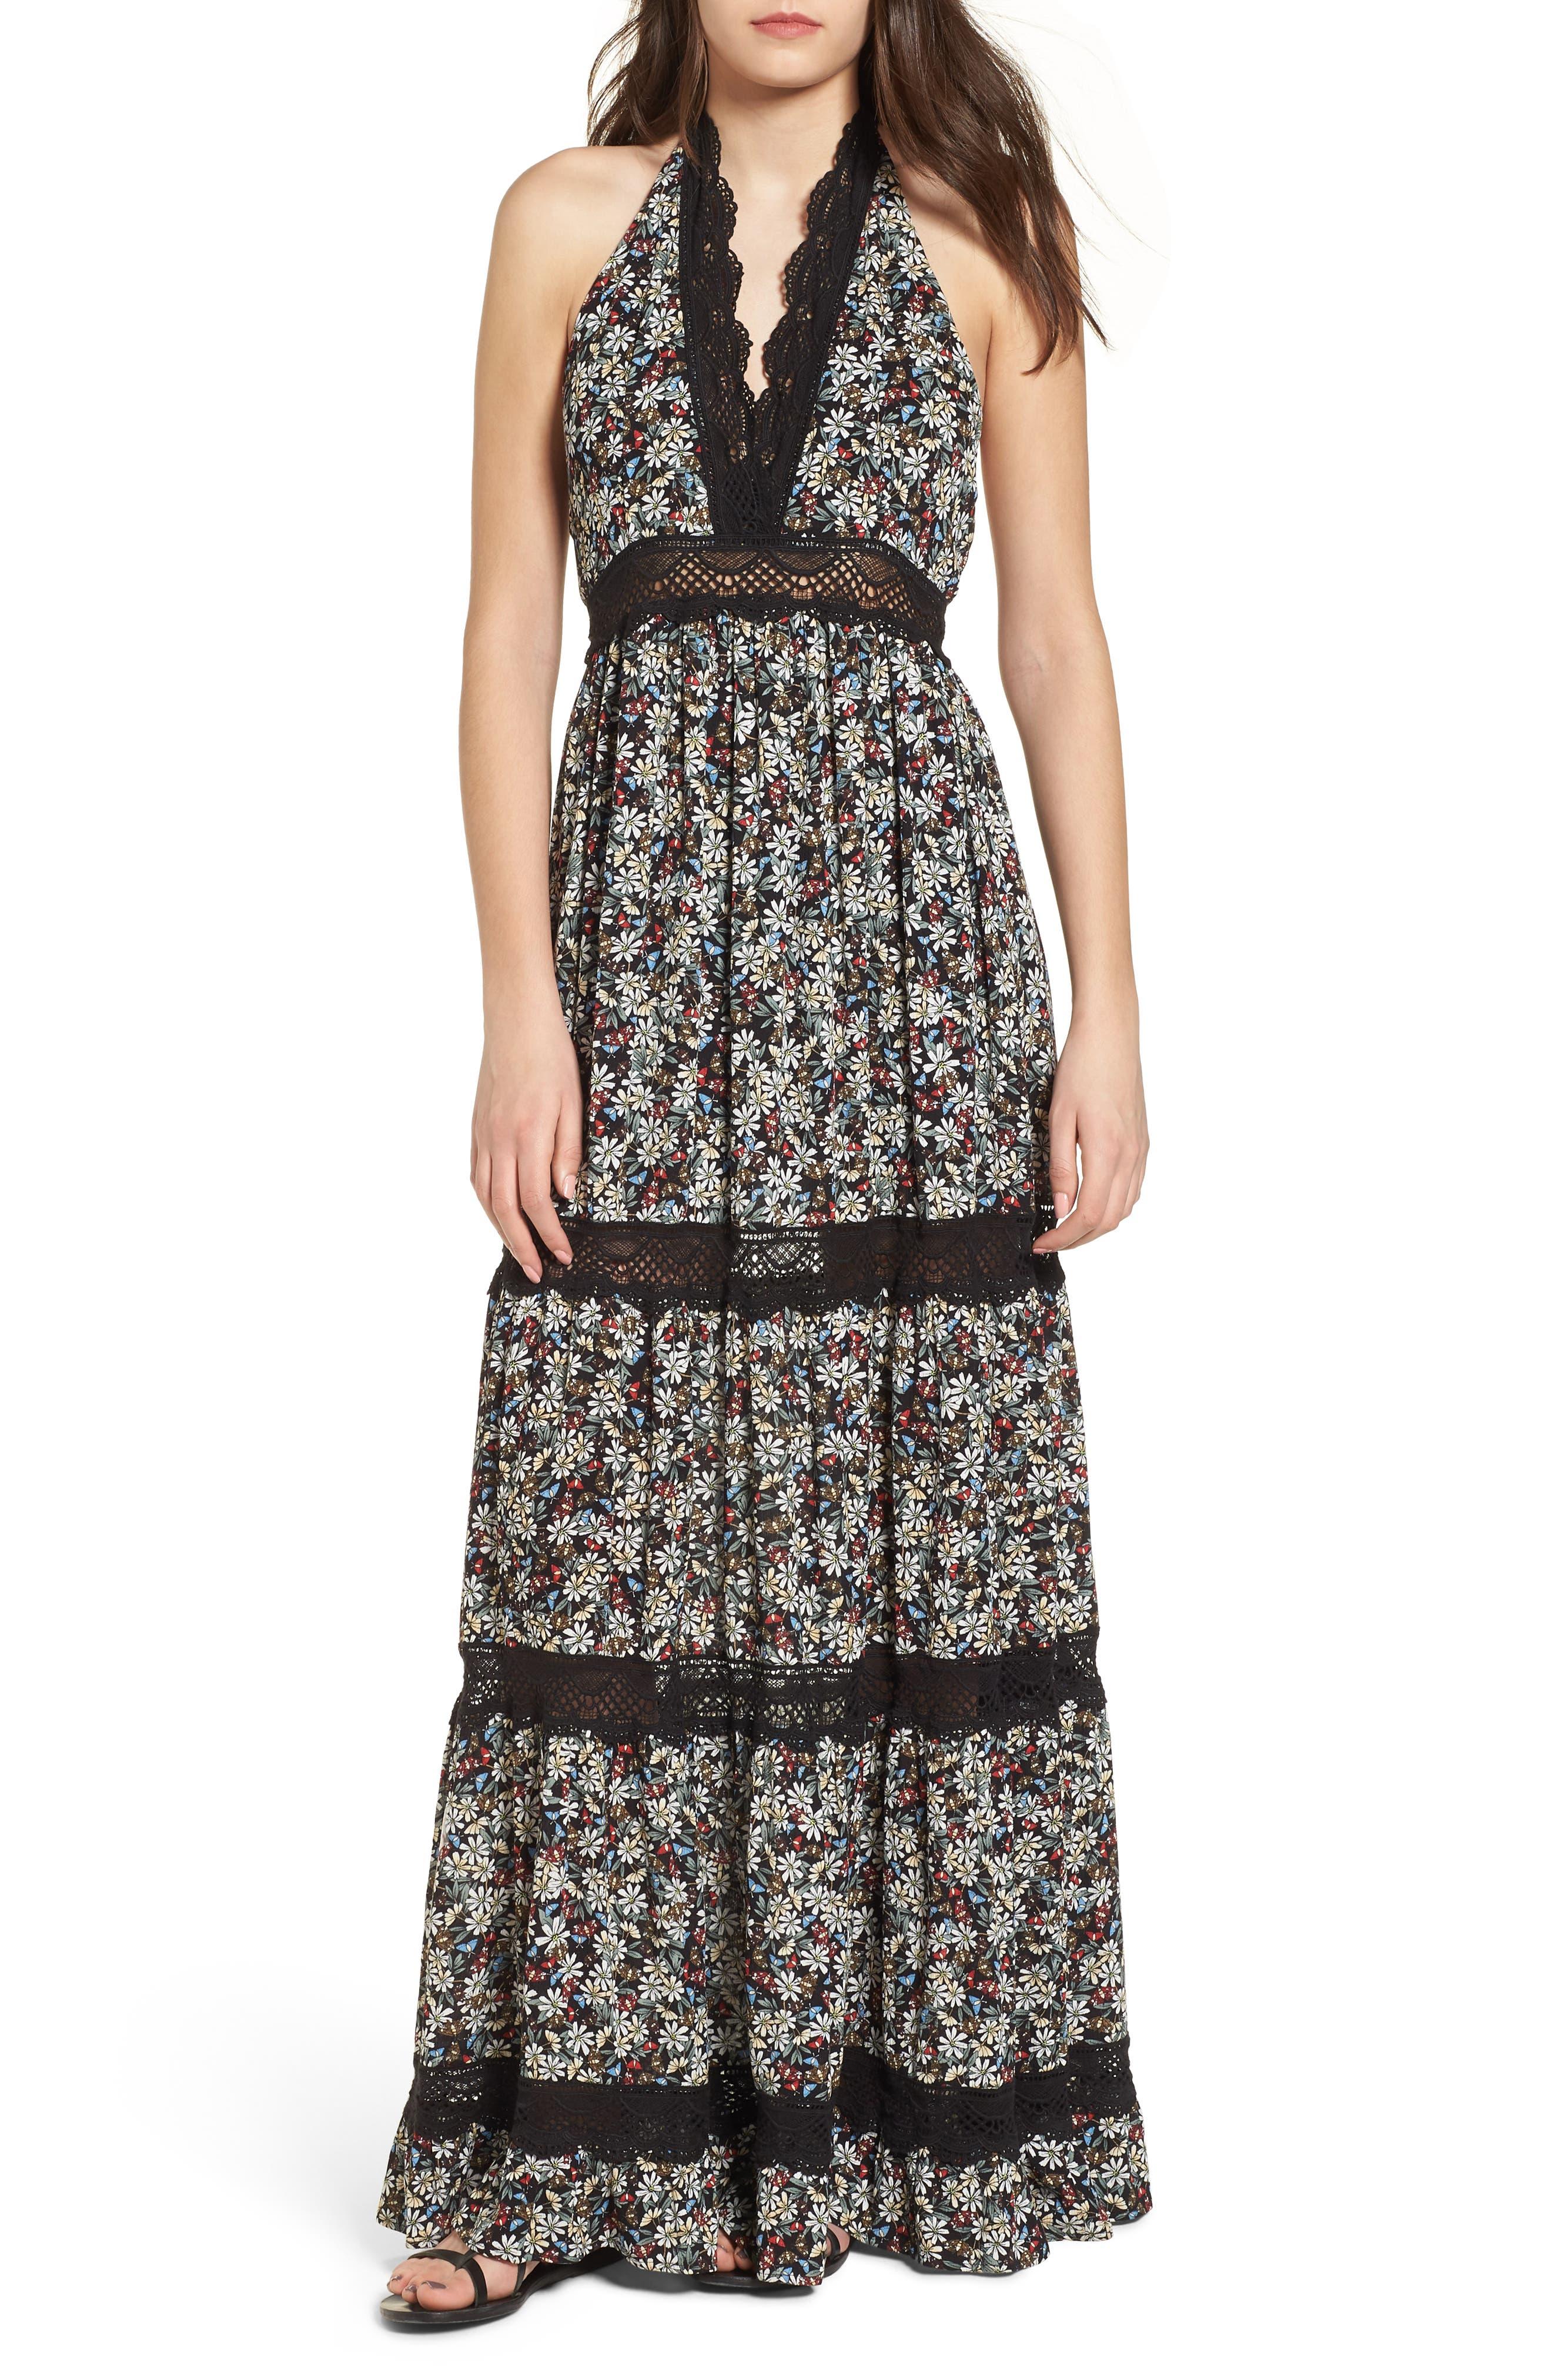 Flora Halter Neck Maxi Dress,                             Main thumbnail 1, color,                             004